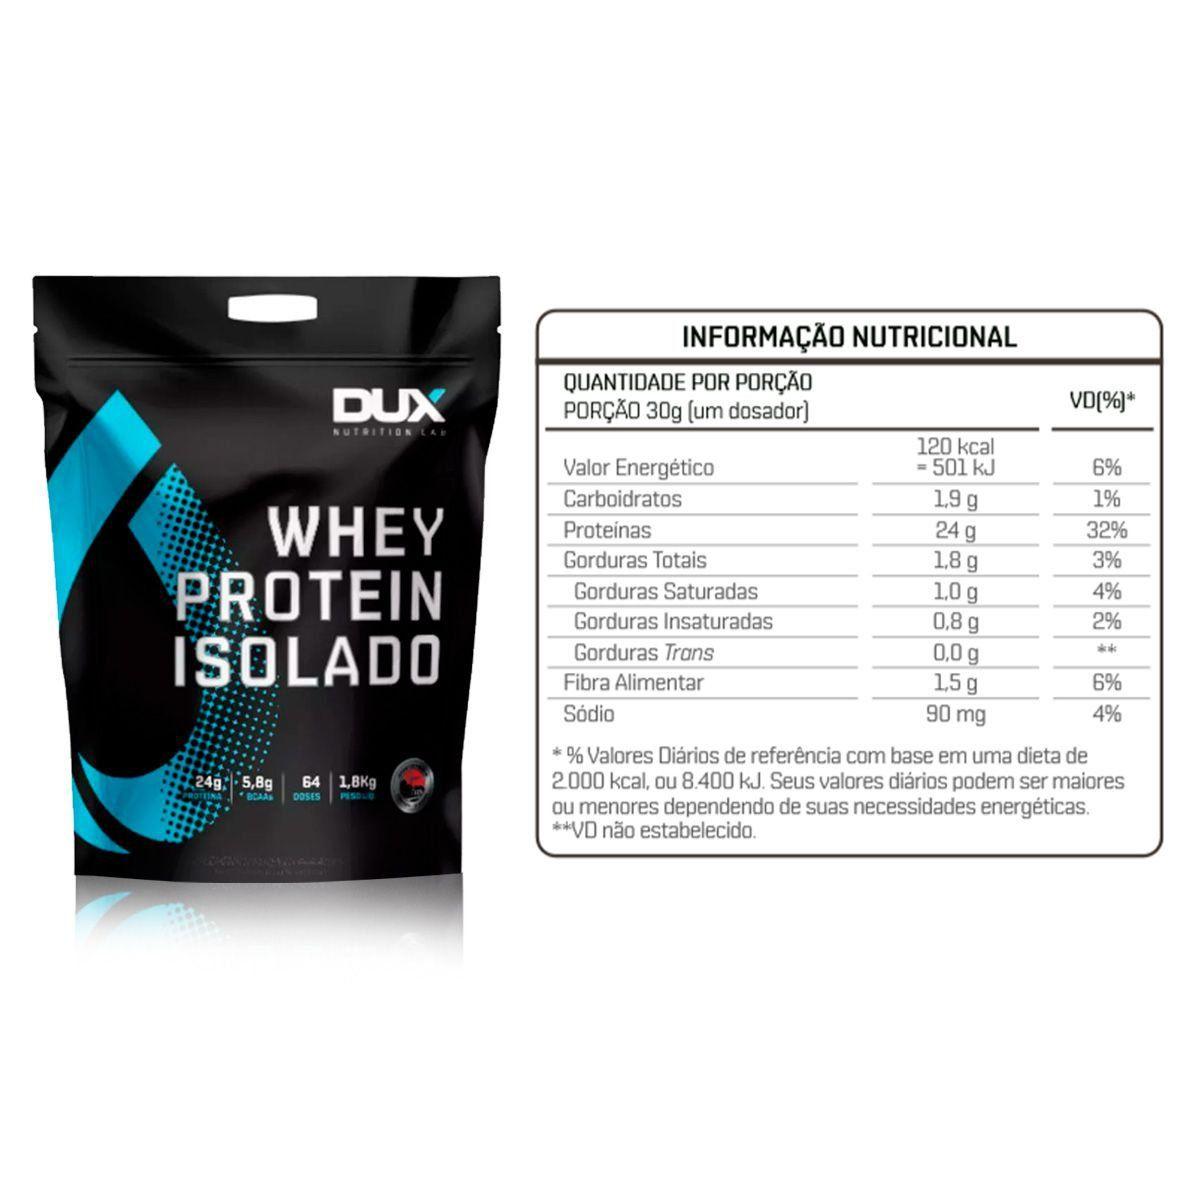 Whey Protein Isolado 1,8kg Refil - Dux Nutrition